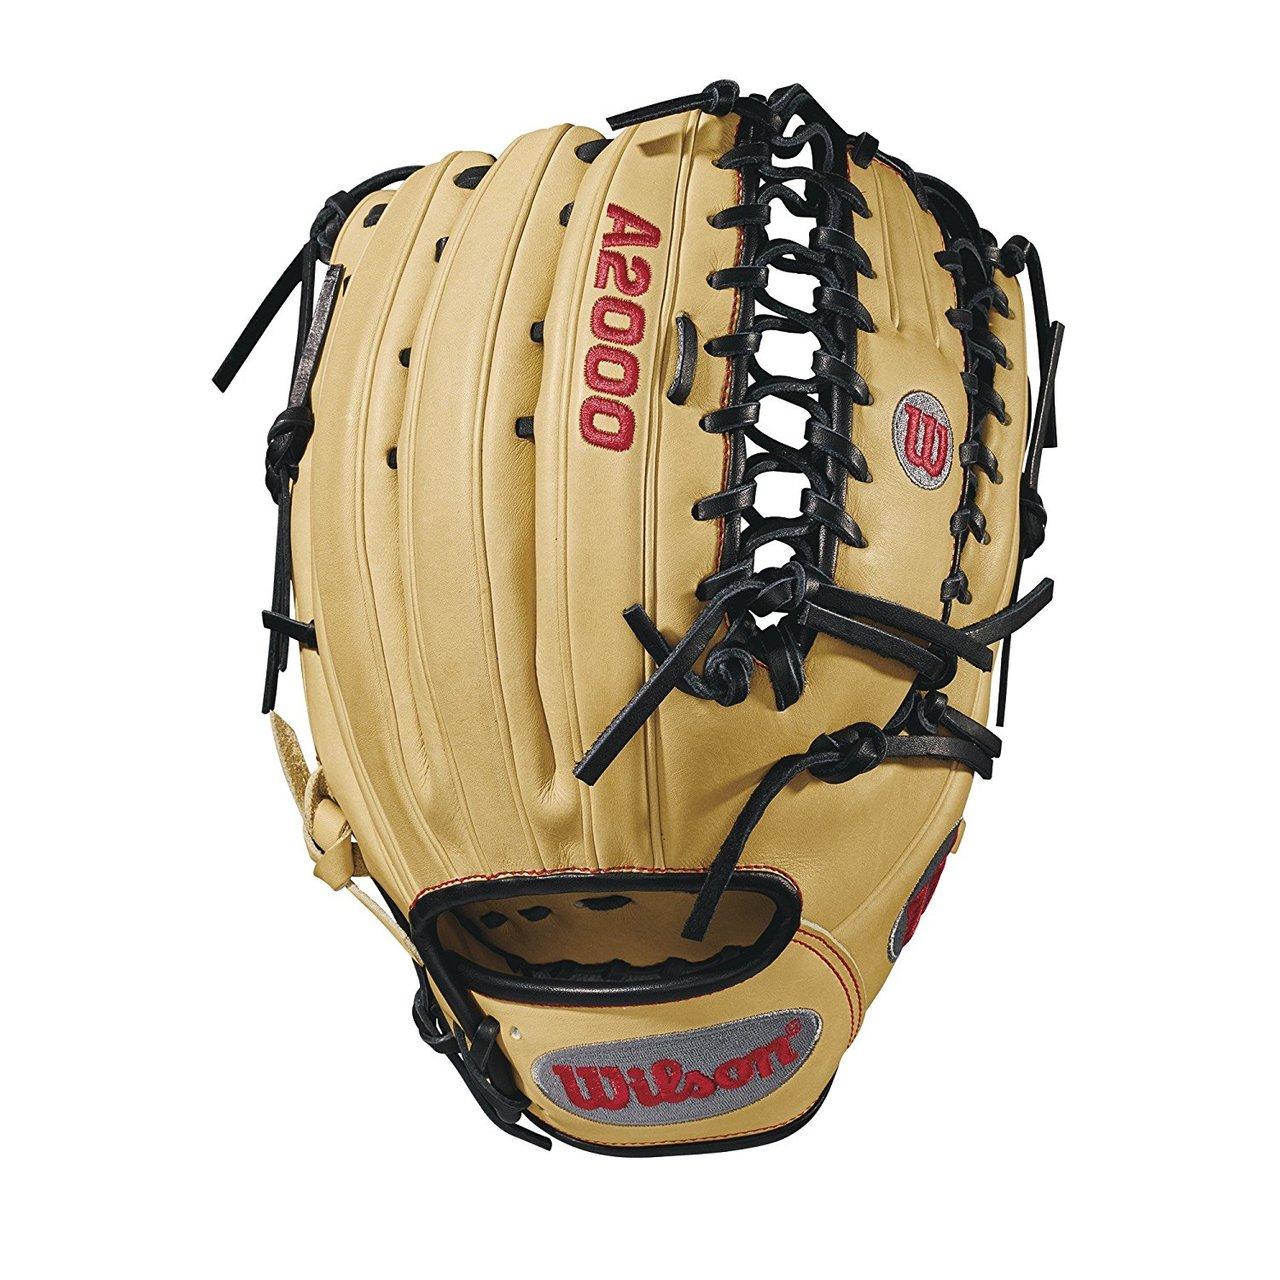 wilson-2018-a2000-ot6-outfield-baseball-glove-right-hand-throw-12-75 WTA20RB18OT6-RightHandThrow Wilson 887768614744 The A2000 OT6 from Wilson features a one-piece six finger palmweb.